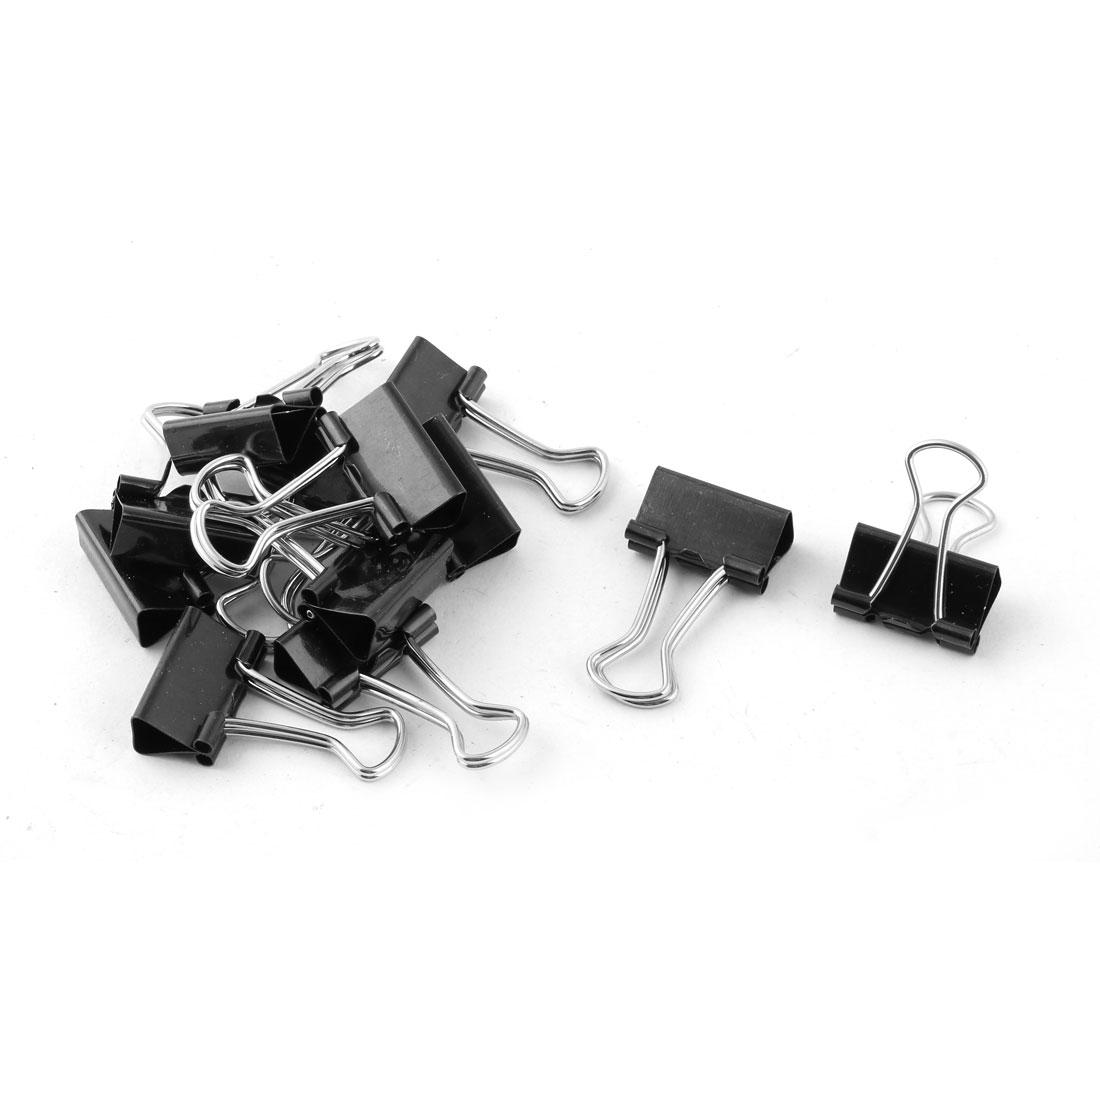 Office Supplies Folder Paper Money Binder Clip Black Silver Tone 12pcs